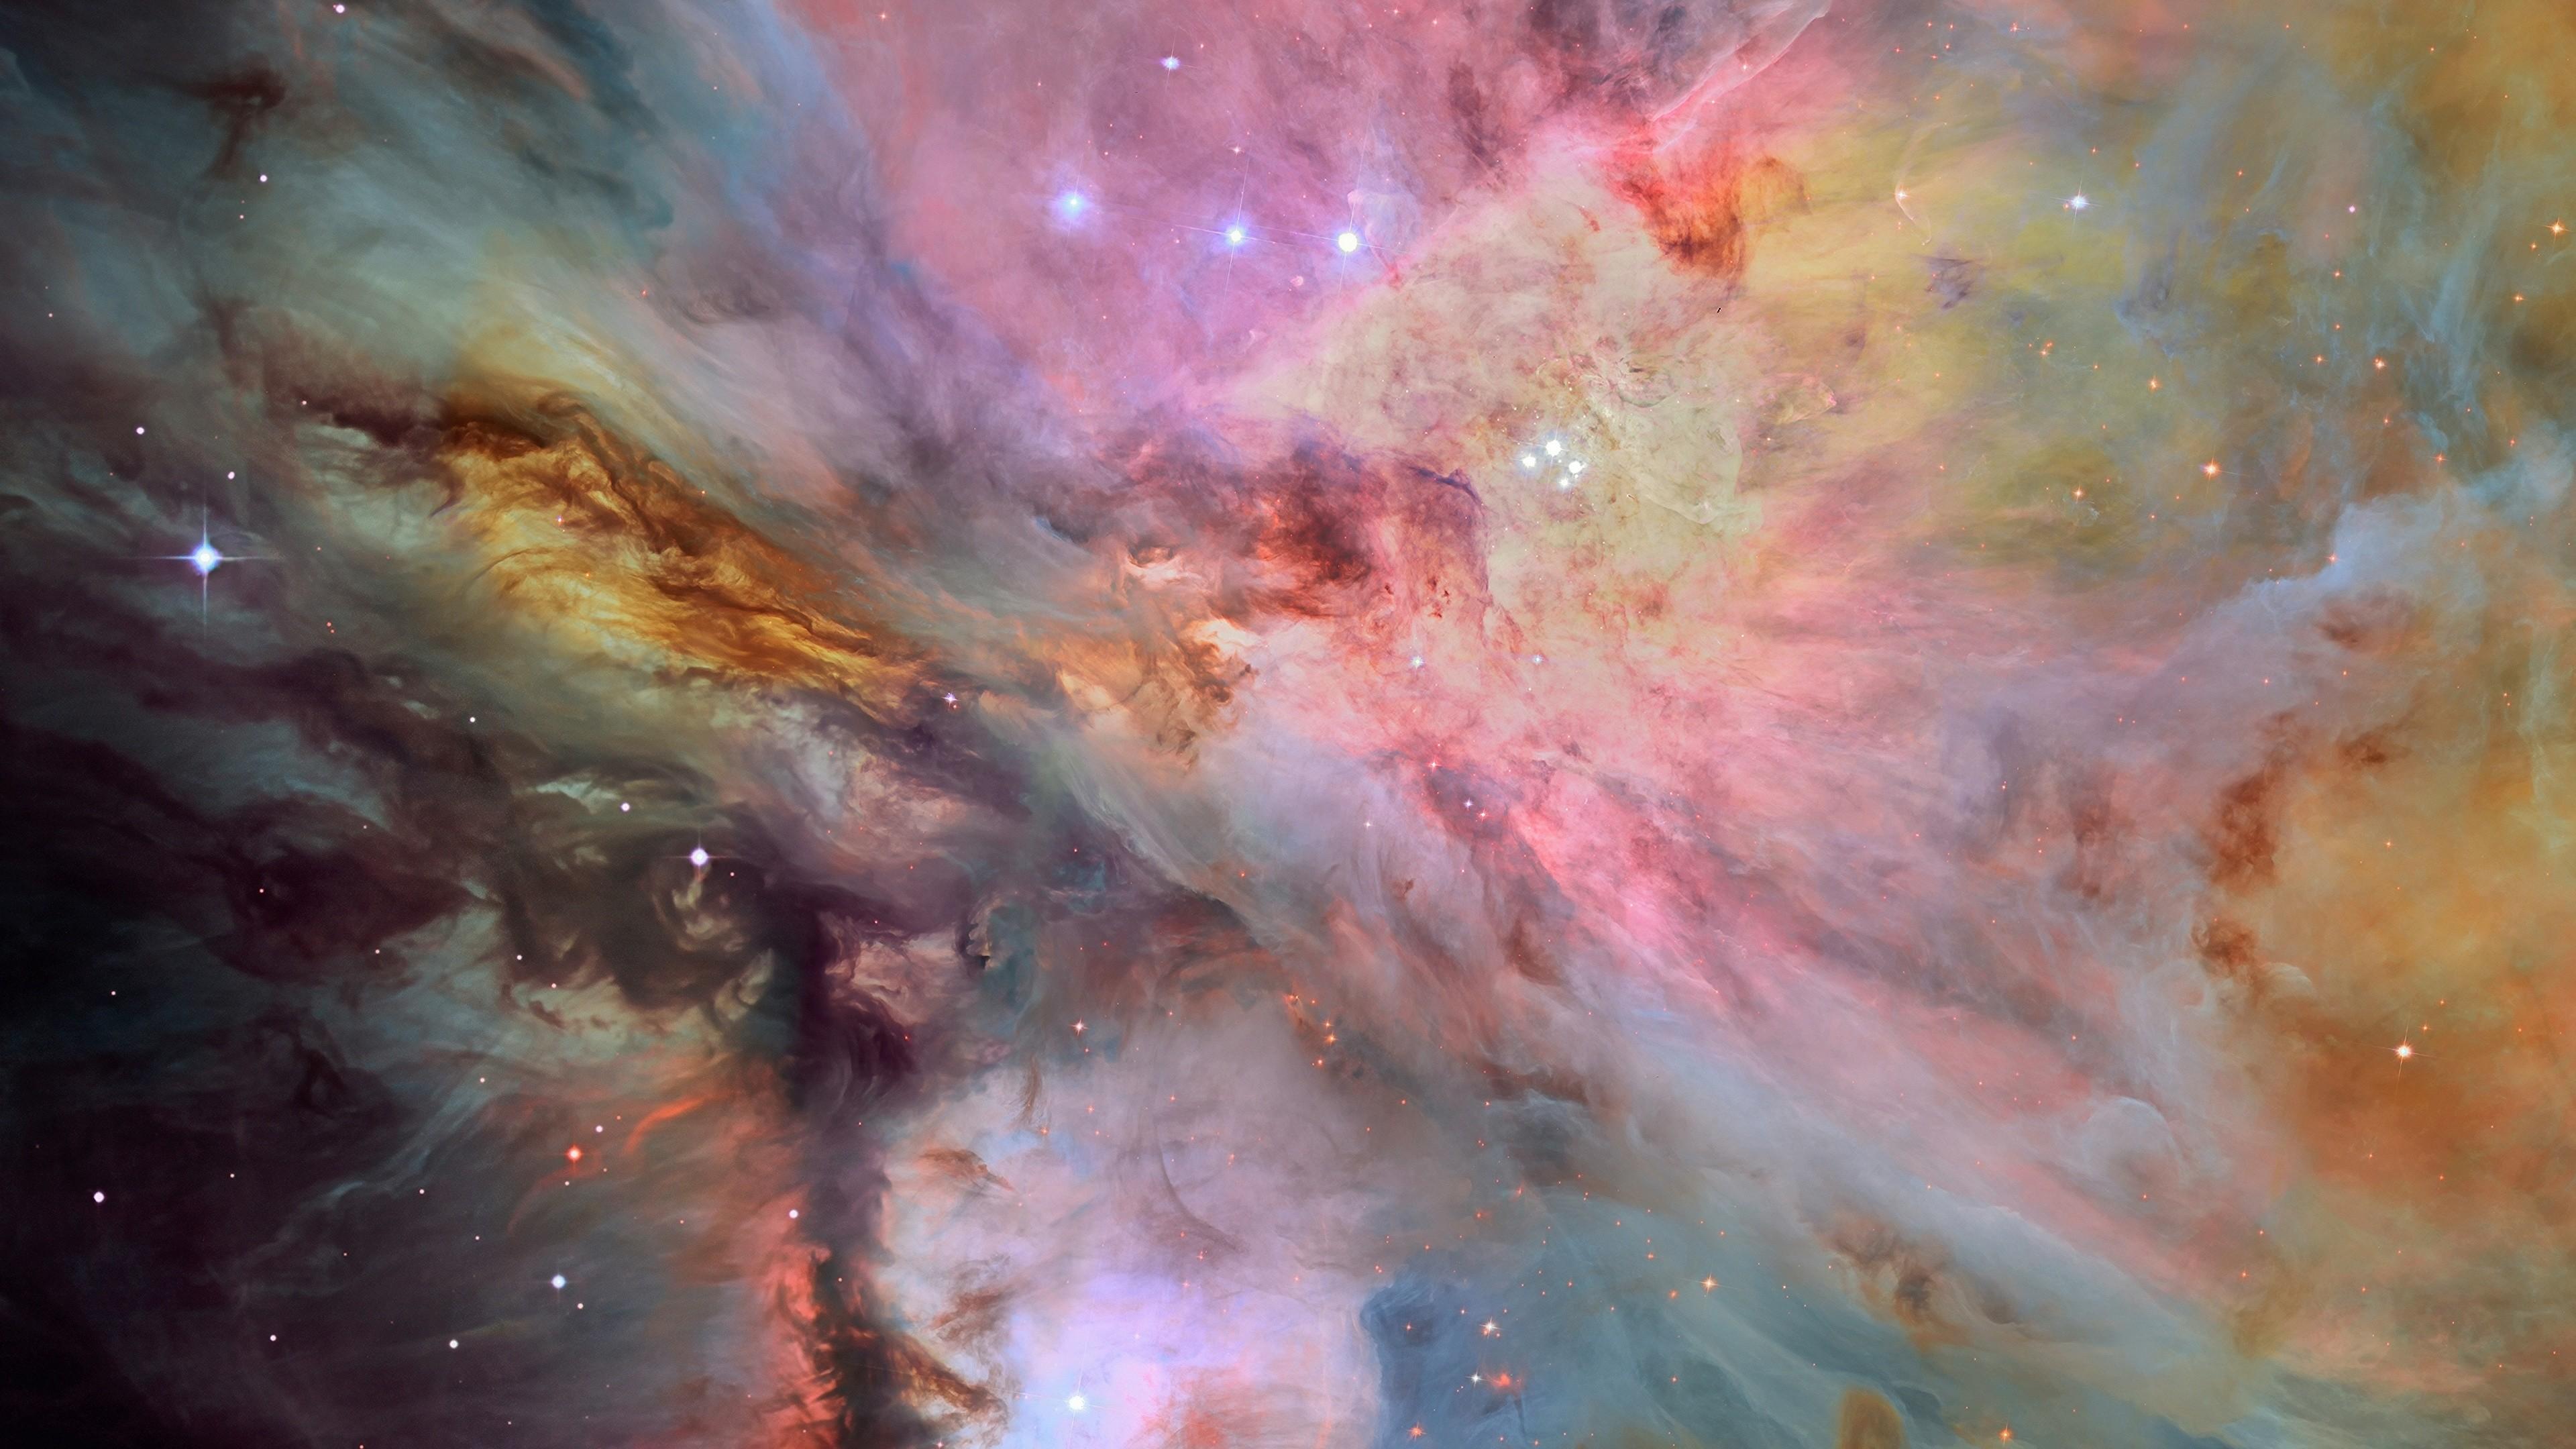 orion nebula wallpaper (70+ images)